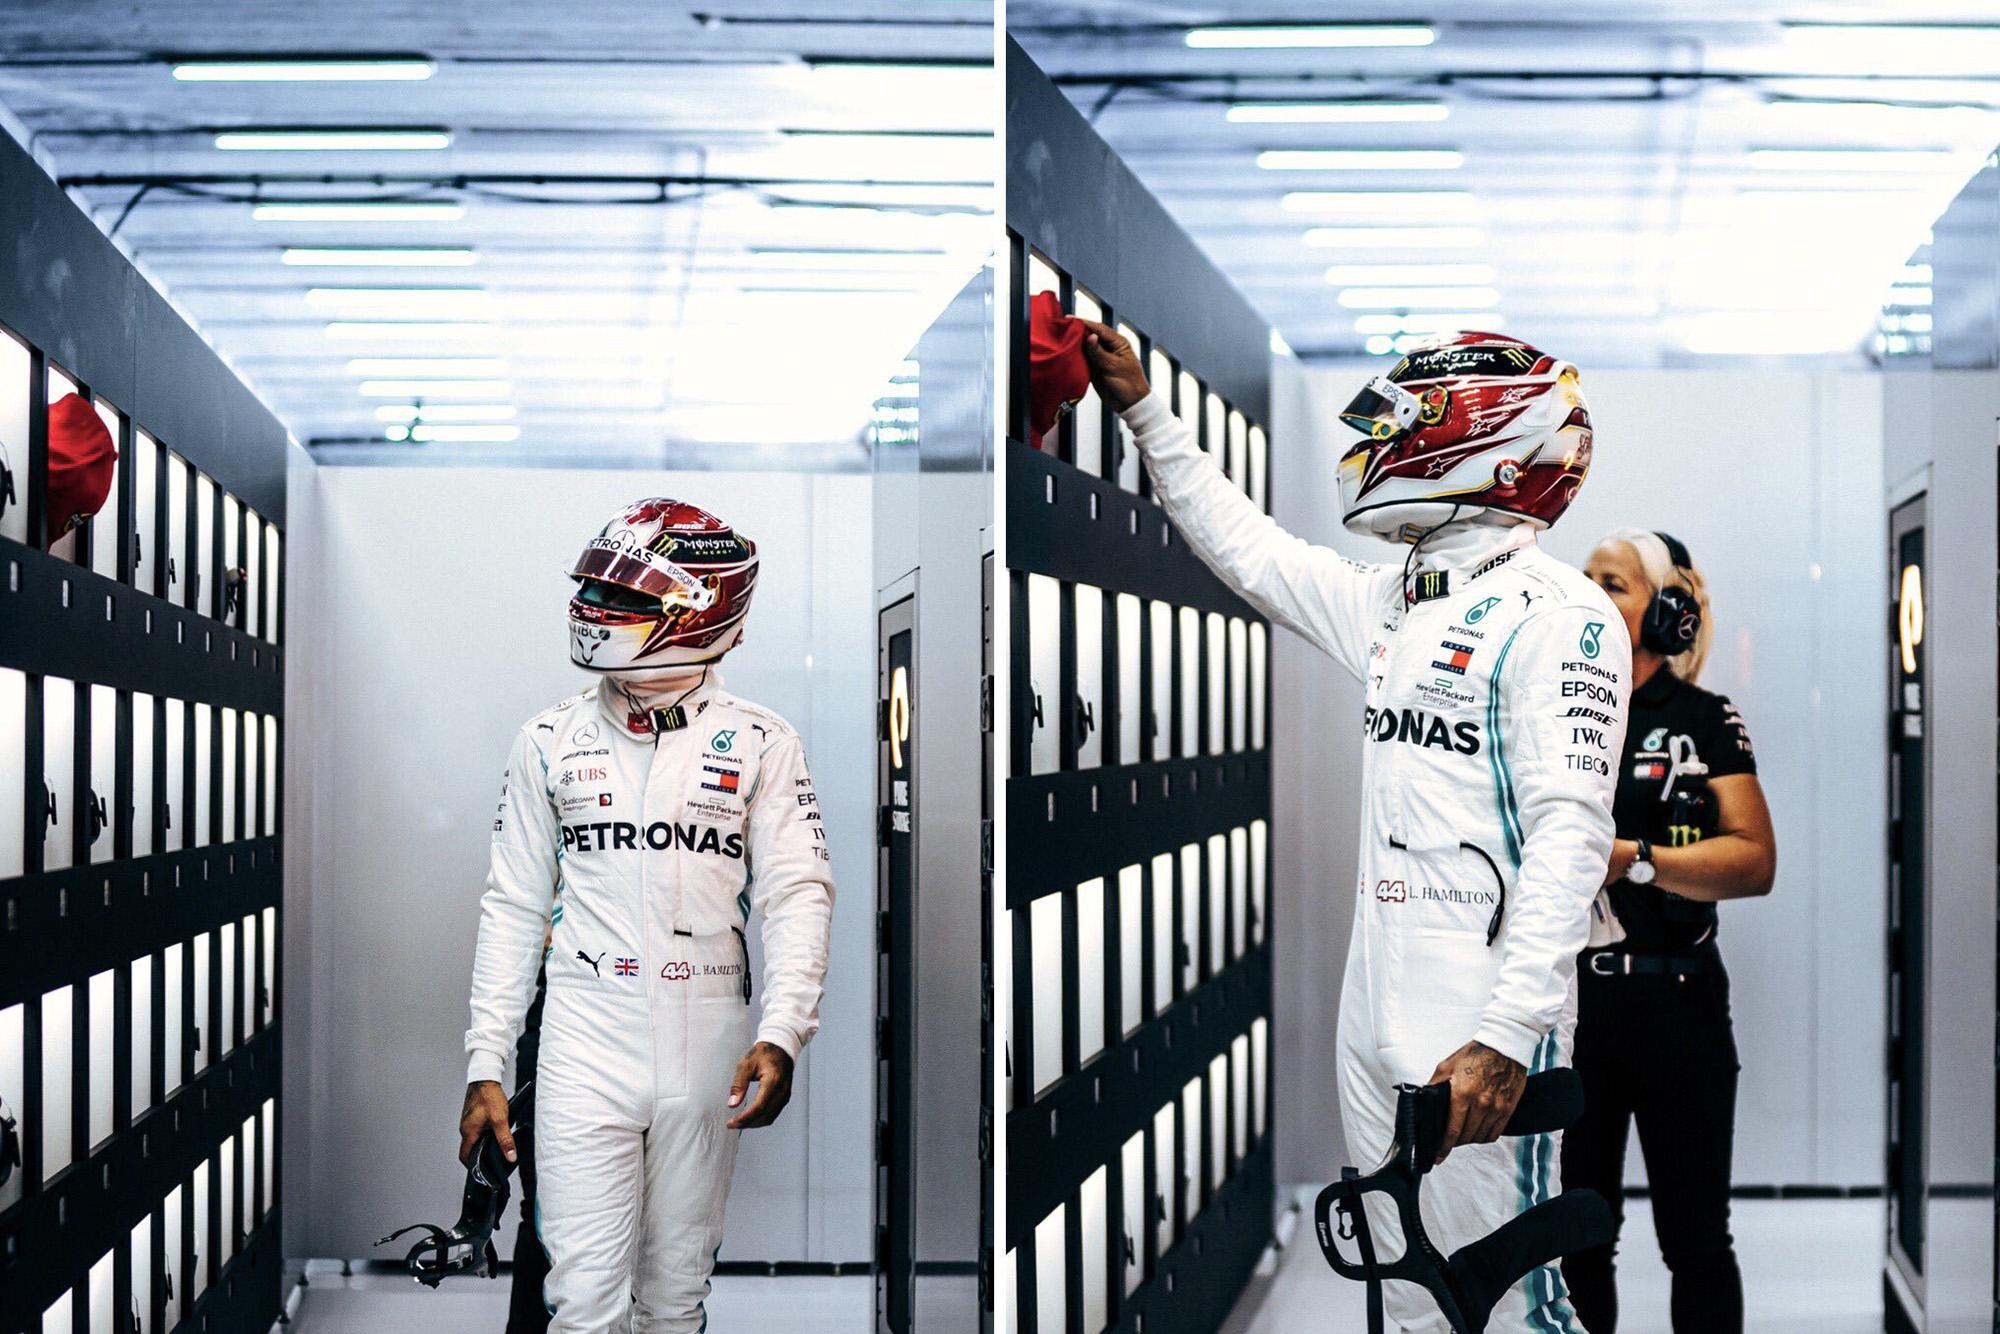 Lewis Hamilton pays tribute to Niki Lauda as he passes his red cap